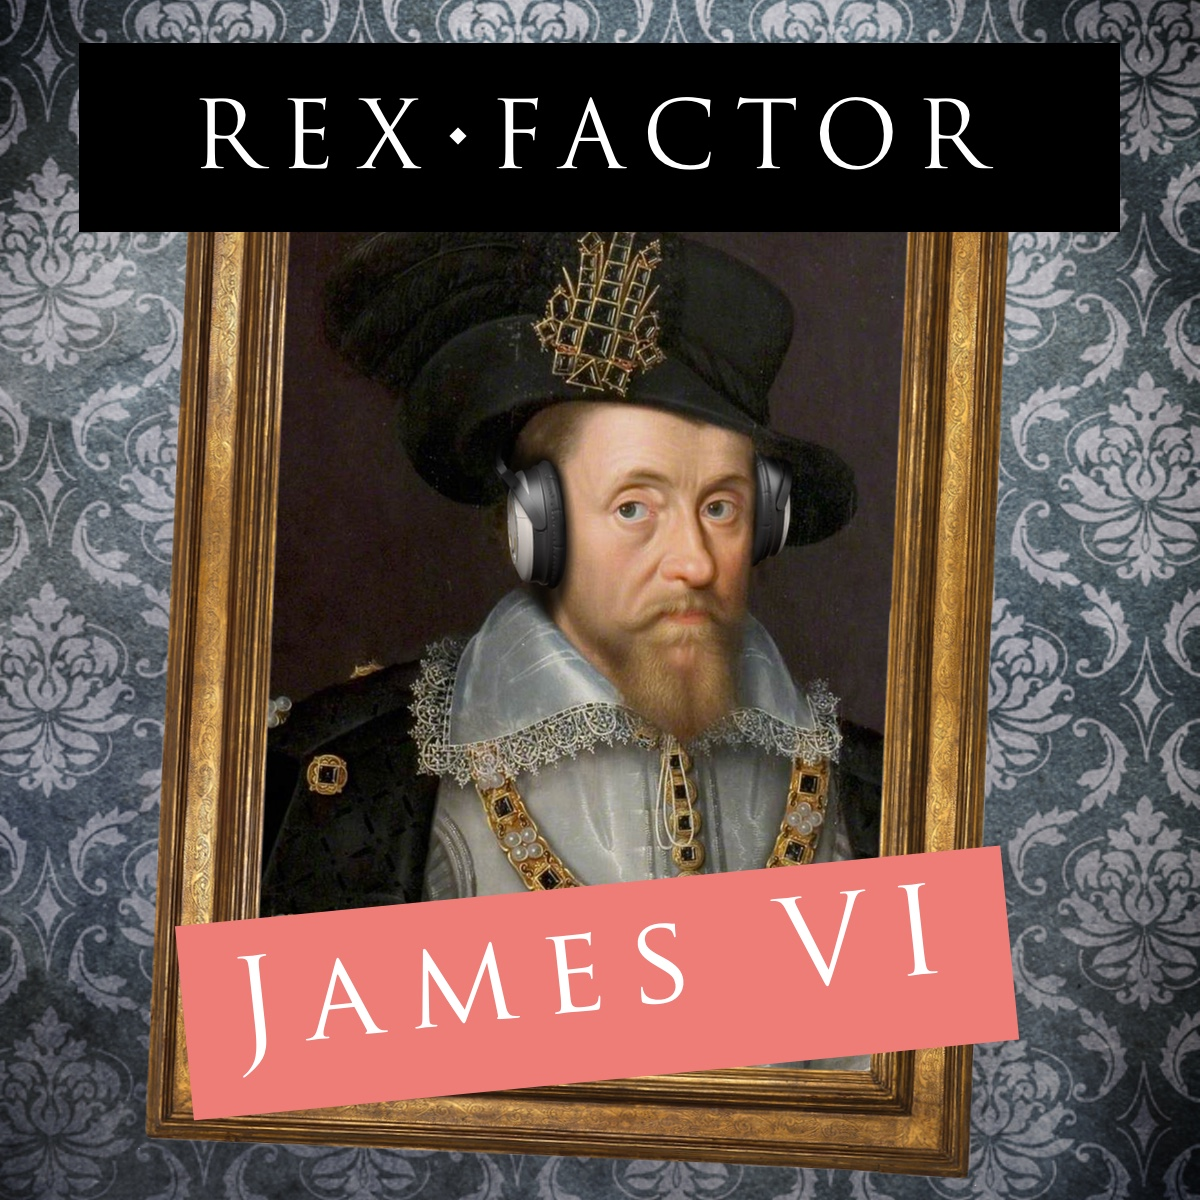 S2.45 James VI (I of England)